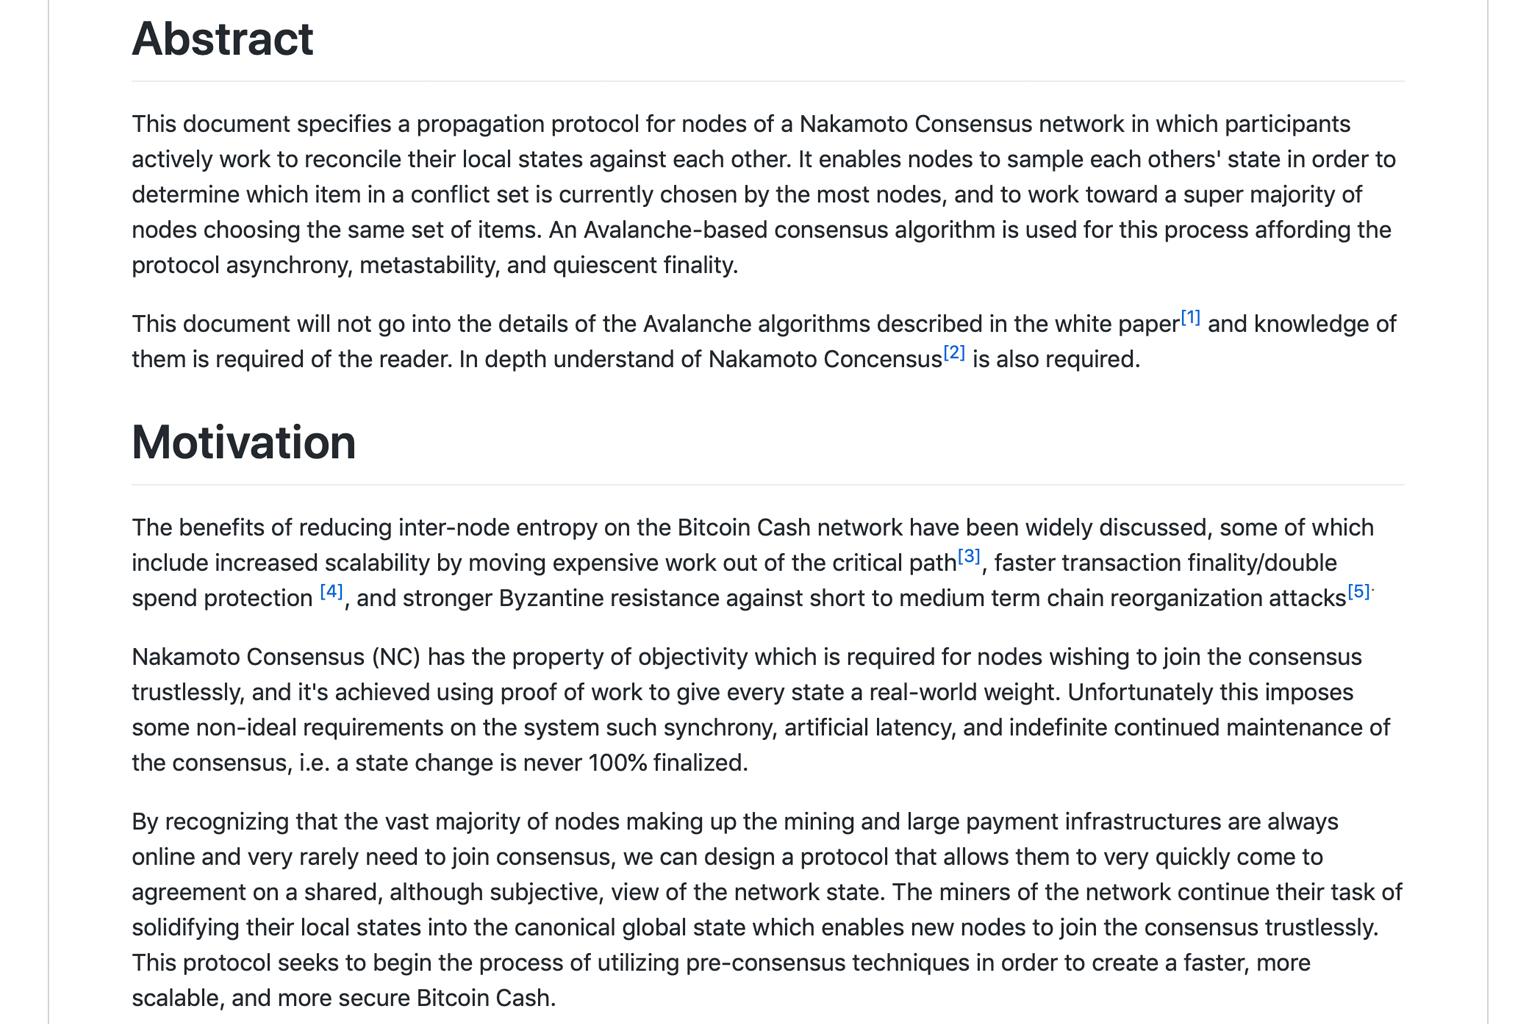 "El desarrollador publica especificaciones para un protocolo de consenso previo de BCH ""width ="" 646 ""height ="" 435 ""srcset = ""https://blackswanfinances.com/wp-content/uploads/2019/12/90000.jpg 1520w, https://news.bitcoin.com/wp-content/uploads/2019/12/90000-300x202. jpg 300w, https://news.bitcoin.com/wp-content/uploads/2019/12/90000-1024x690.jpg 1024w, https://news.bitcoin.com/wp-content/uploads/2019/12/ 90000-768x517.jpg 768w, https://news.bitcoin.com/wp-content/uploads/2019/12/90000-696x469.jpg 696w, https://news.bitcoin.com/wp-content/uploads/ 2019/12 / 90000-1392x938.jpg 1392w, https://news.bitcoin.com/wp-content/upload s / 2019/12 / 90000-1068x719.jpg 1068w, https://news.bitcoin.com/wp-content/uploads/2019/12/90000-623x420.jpg 623w, https://news.bitcoin.com/ wp-content / uploads / 2019/12 / 90000-190x128.jpg 190w, https://news.bitcoin.com/wp-content/uploads/2019/12/90000-380x256.jpg 380w, https: // noticias. bitcoin.com/wp-content/uploads/2019/12/90000-760x512.jpg 760w ""tamaños ="" (ancho máximo: 646px) 100vw, 646px"